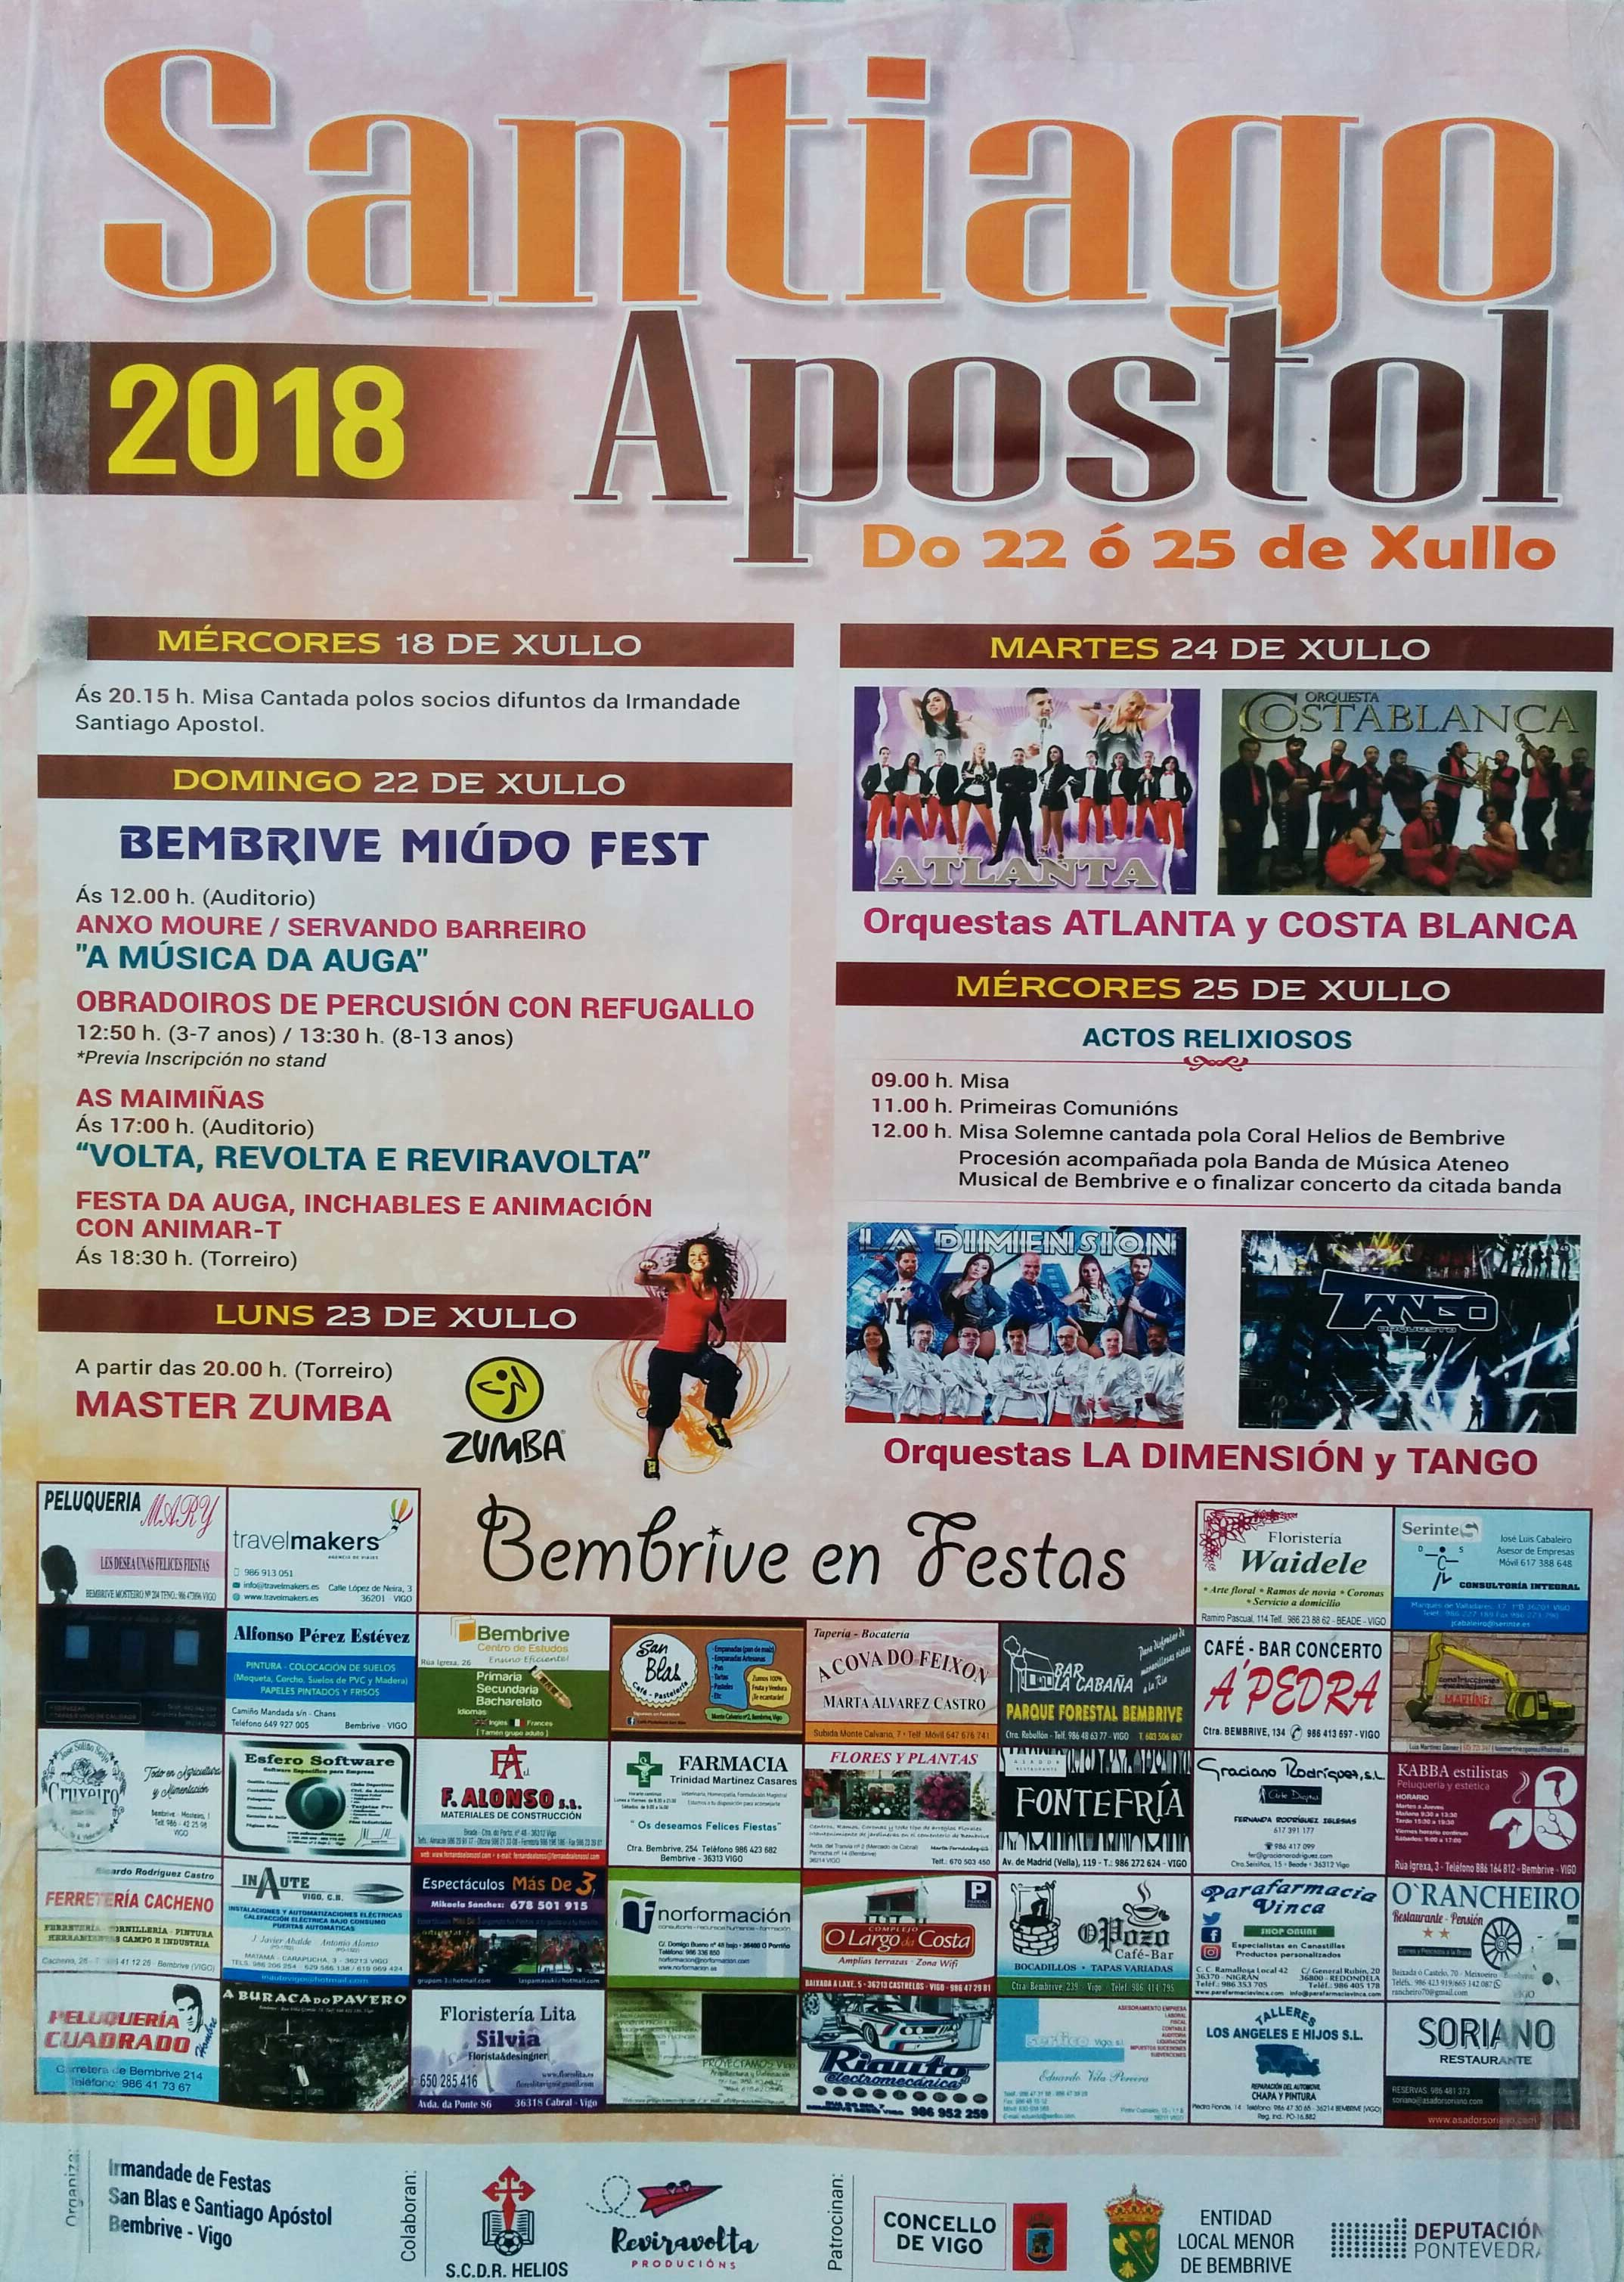 Fiestas Santiago Apóstol Bembrive 2018